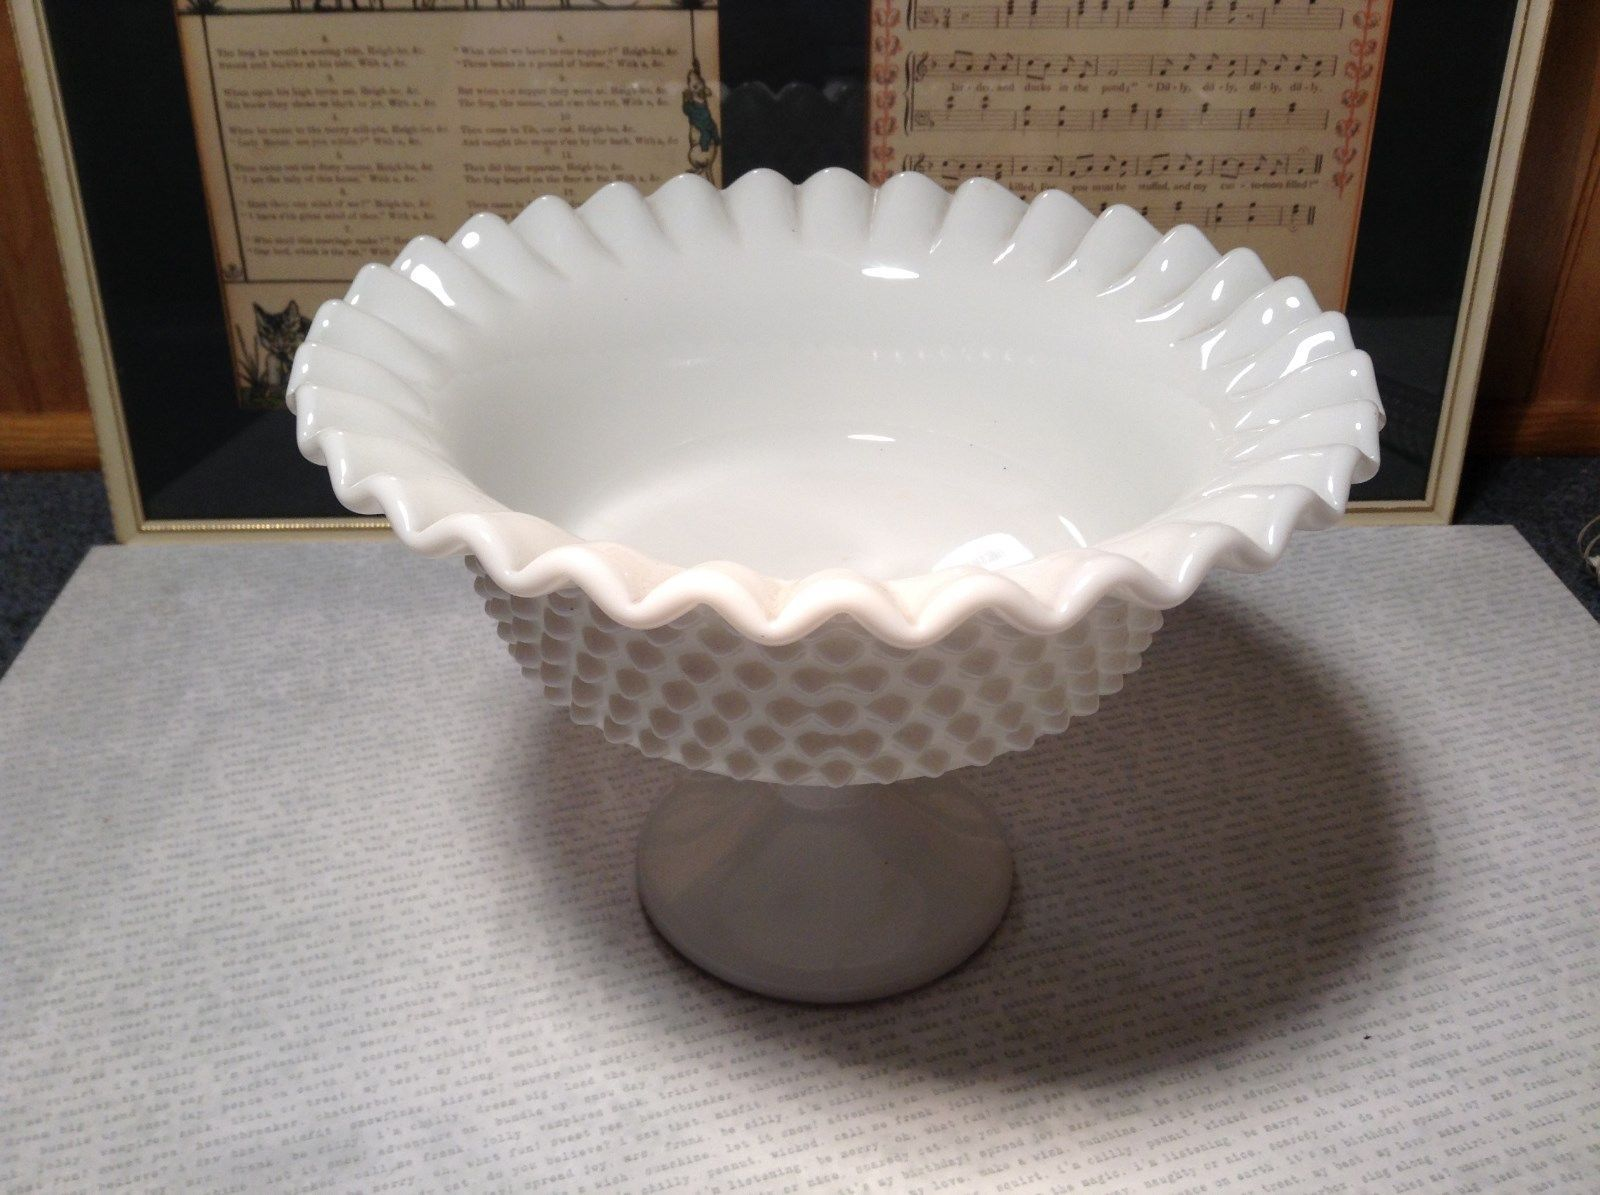 White Milk Glass Vintage Raised Serving Bowl Ruffled Edges Along Top Hobnail